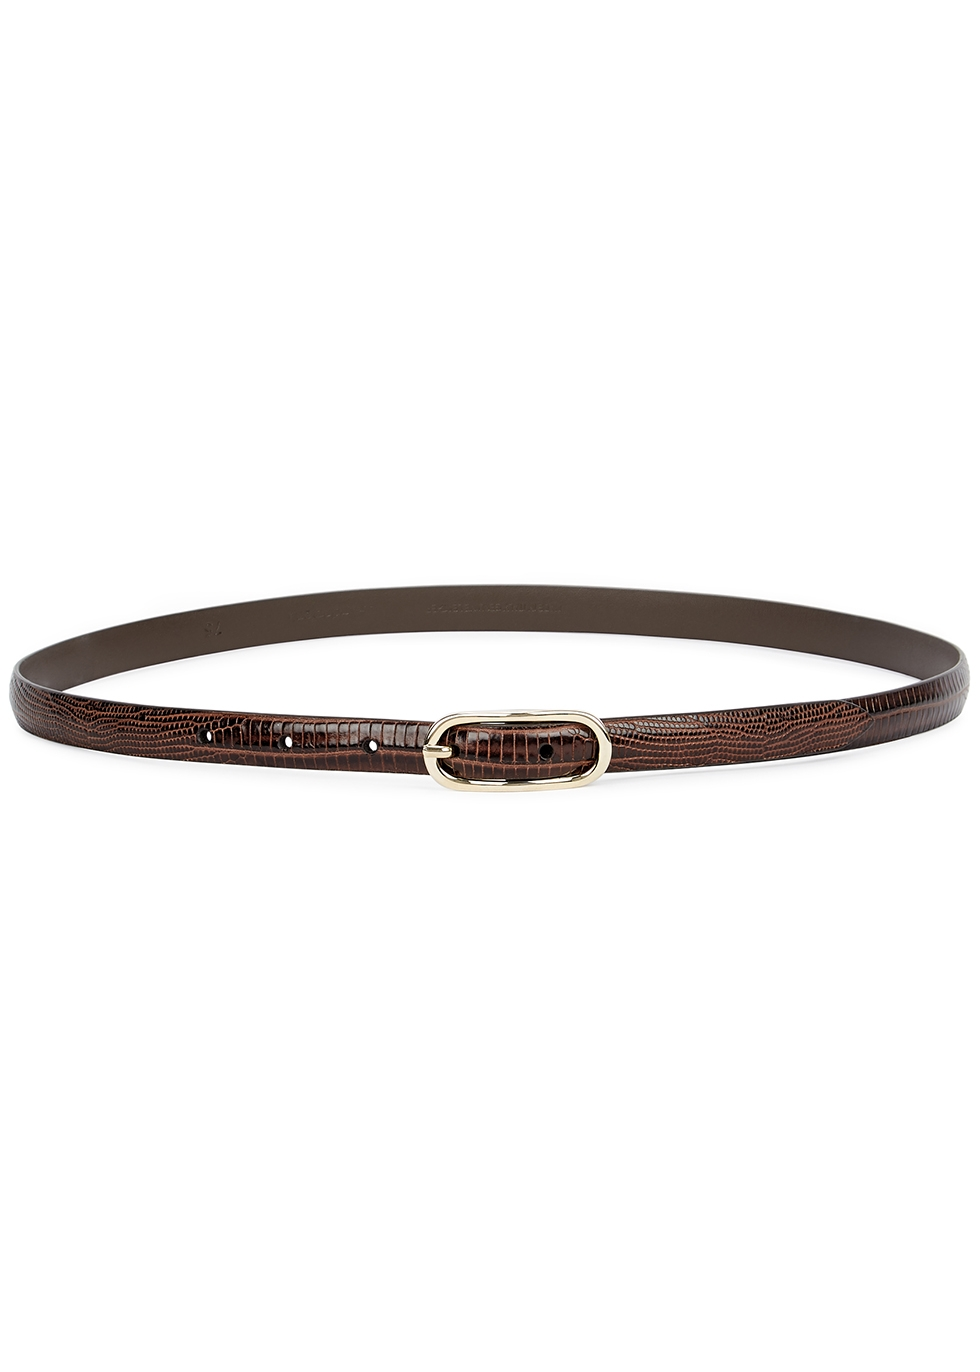 Brown lizard-effect leather belt